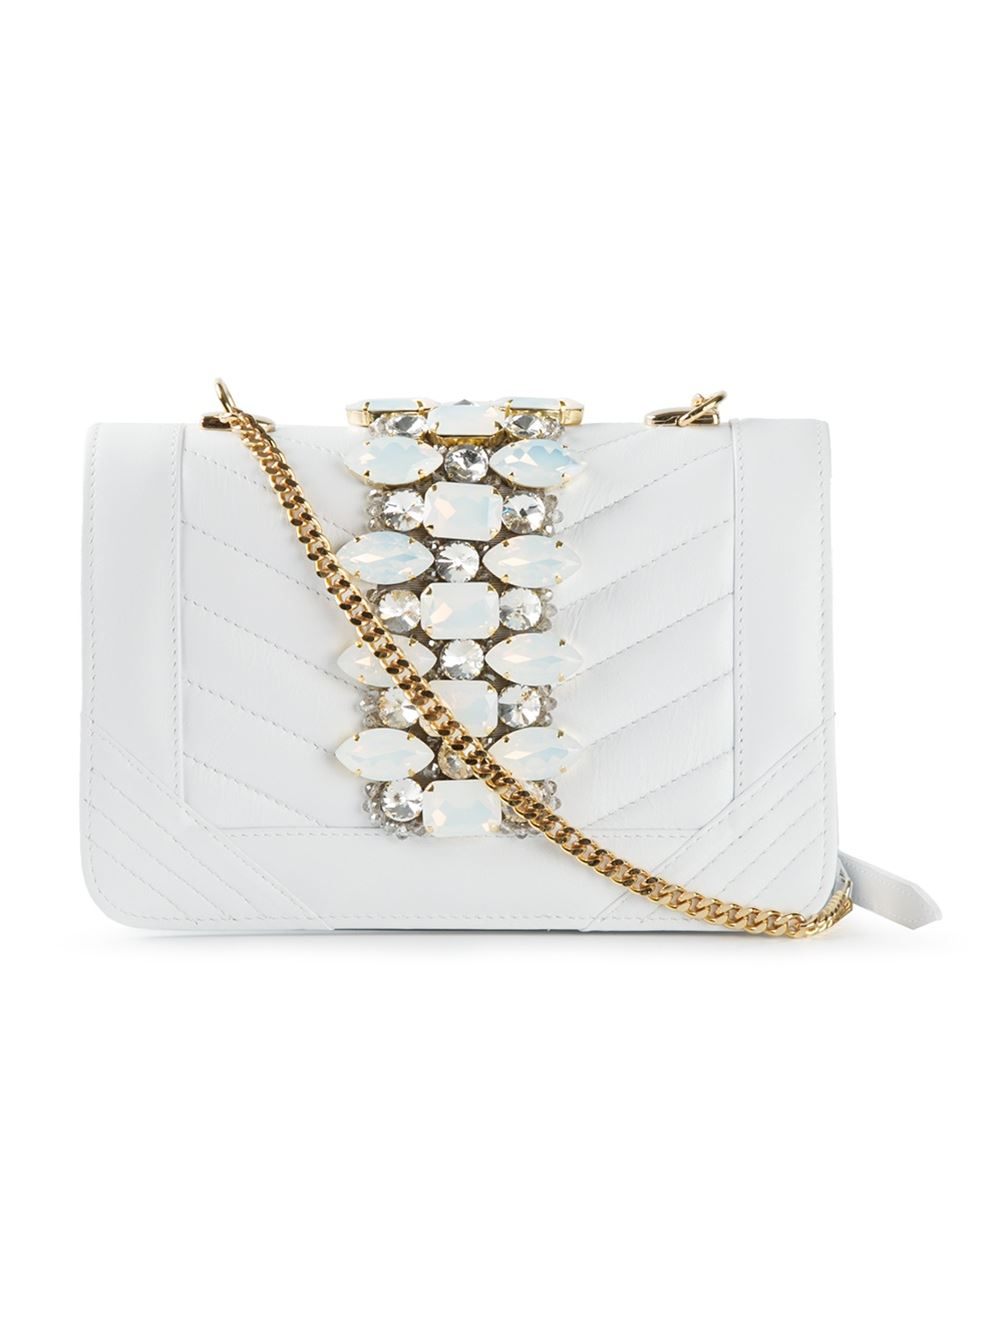 Lyst - Gedebe Bibi Leather Cross-Body Bag in White 4445e057006cd